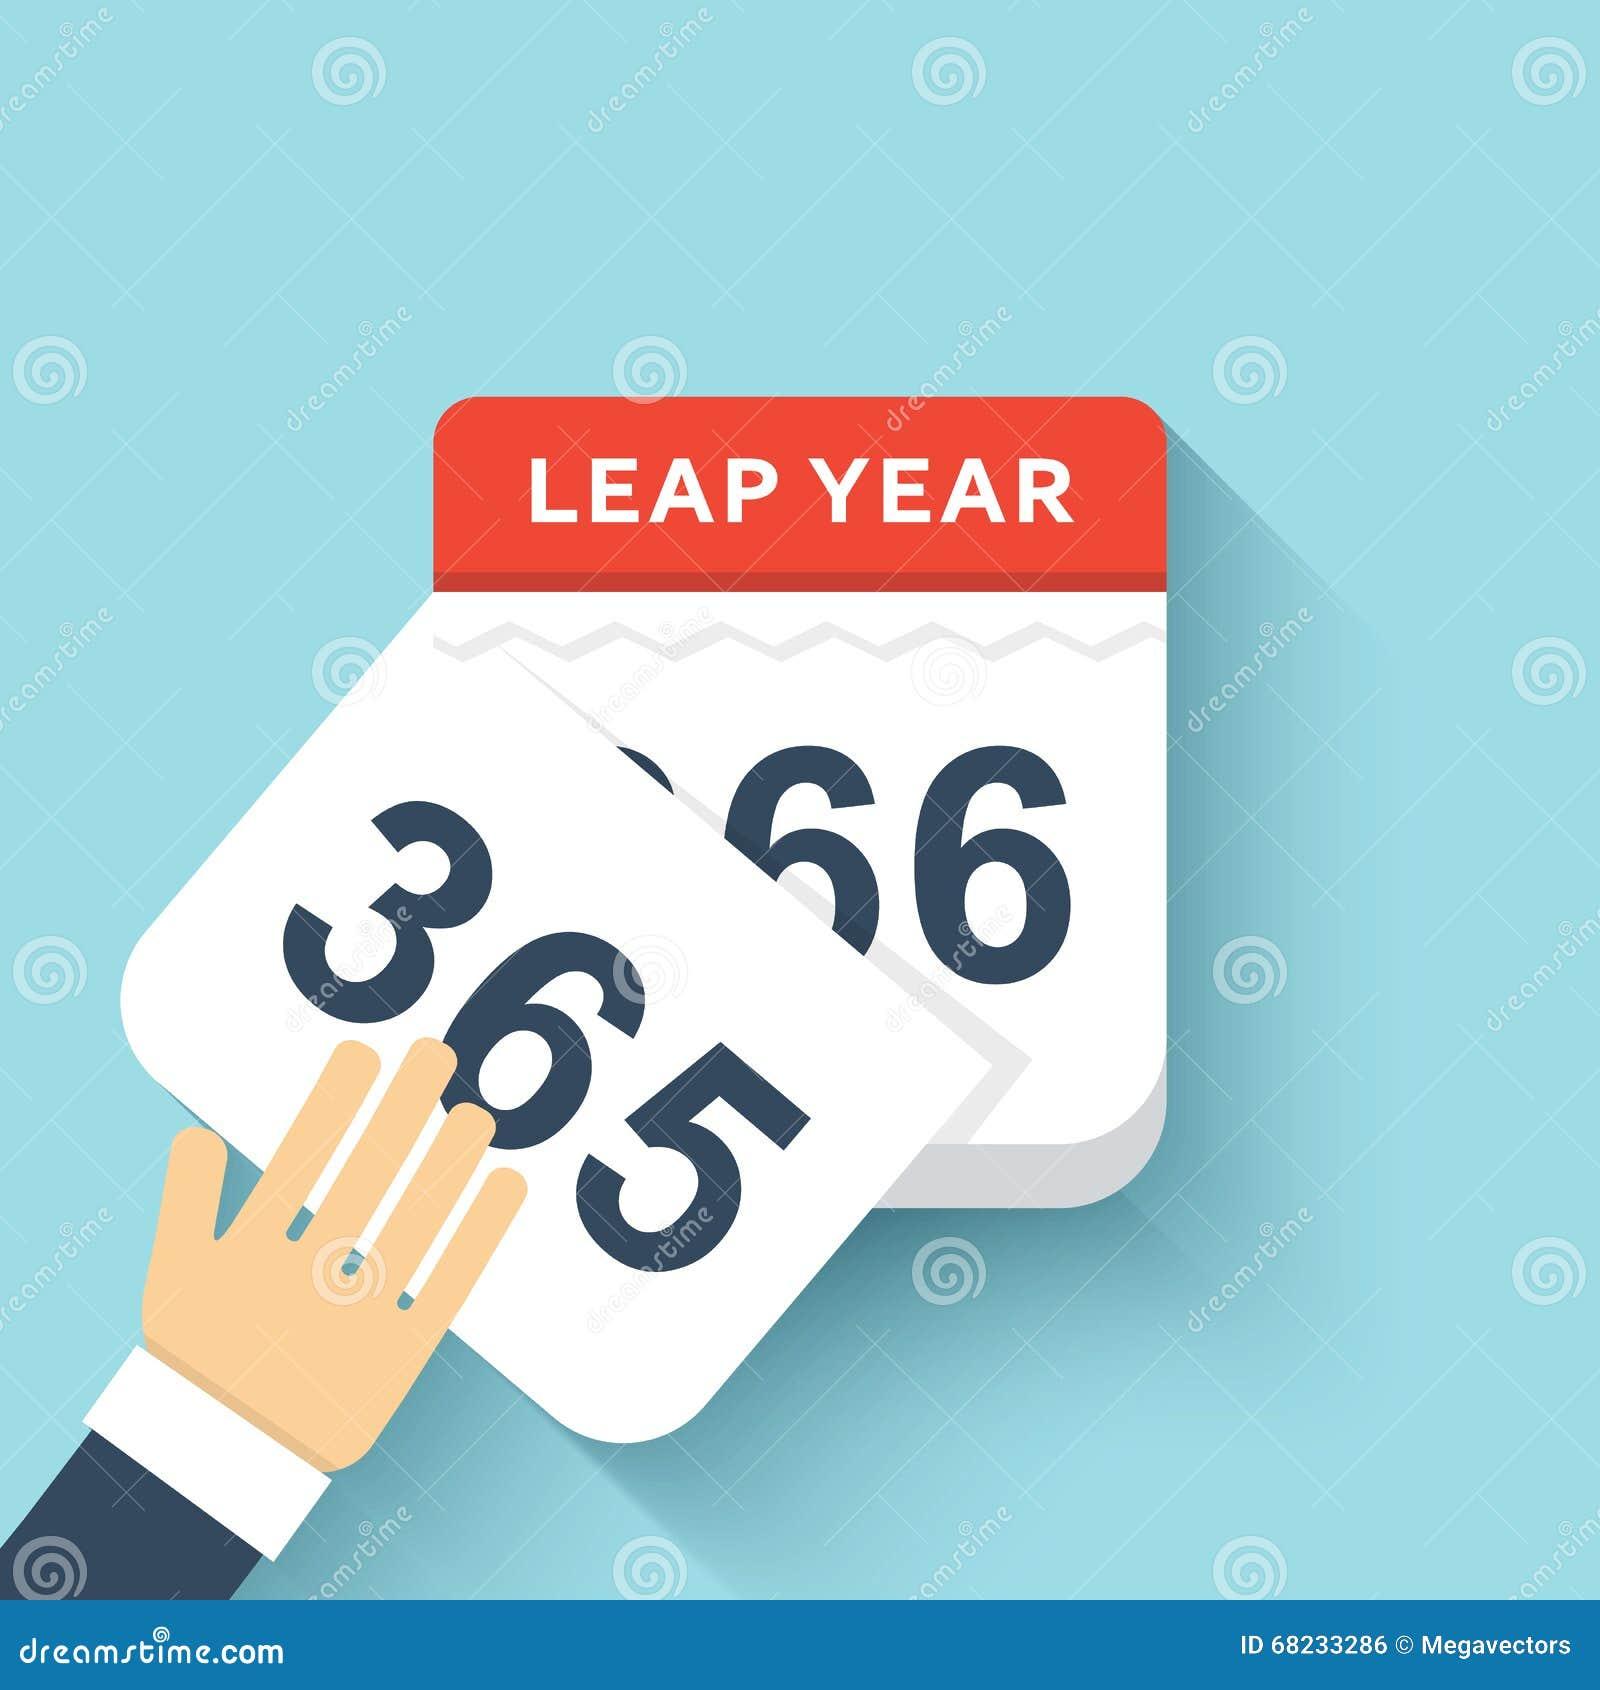 calendar style flat leap year 366 days calendars design 2016